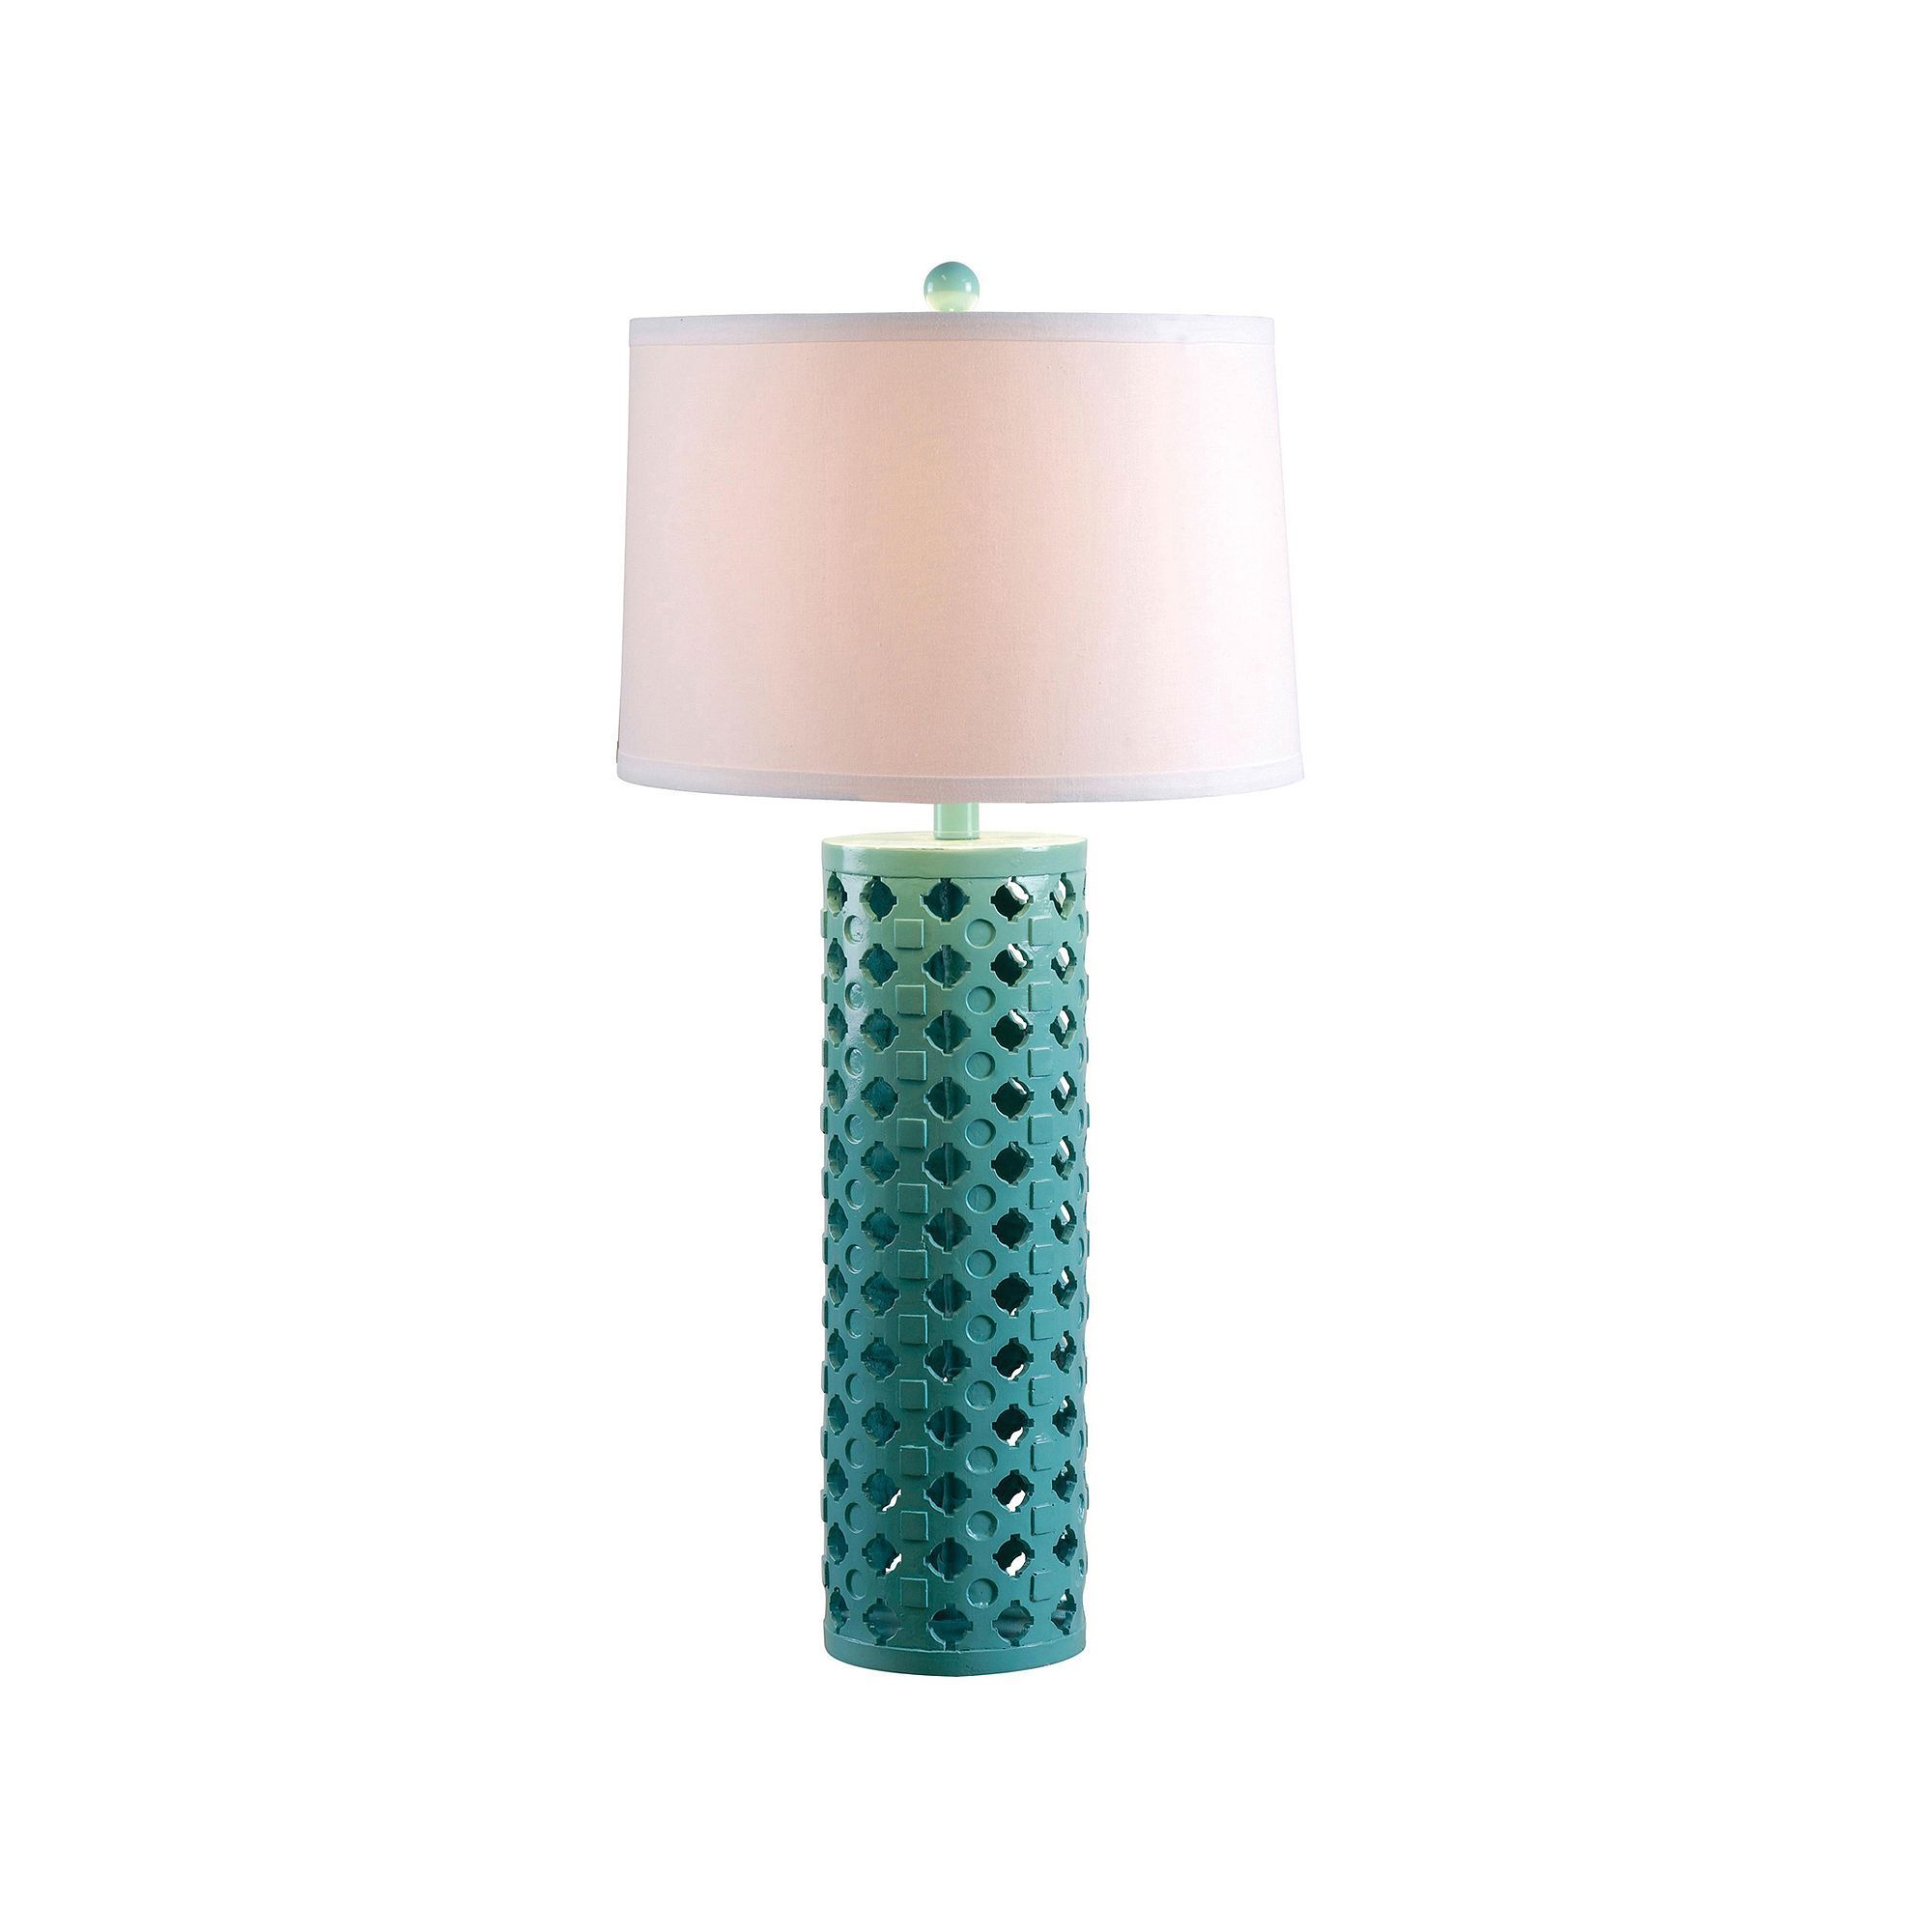 Kenroy Home Marrakesh Table Lamp